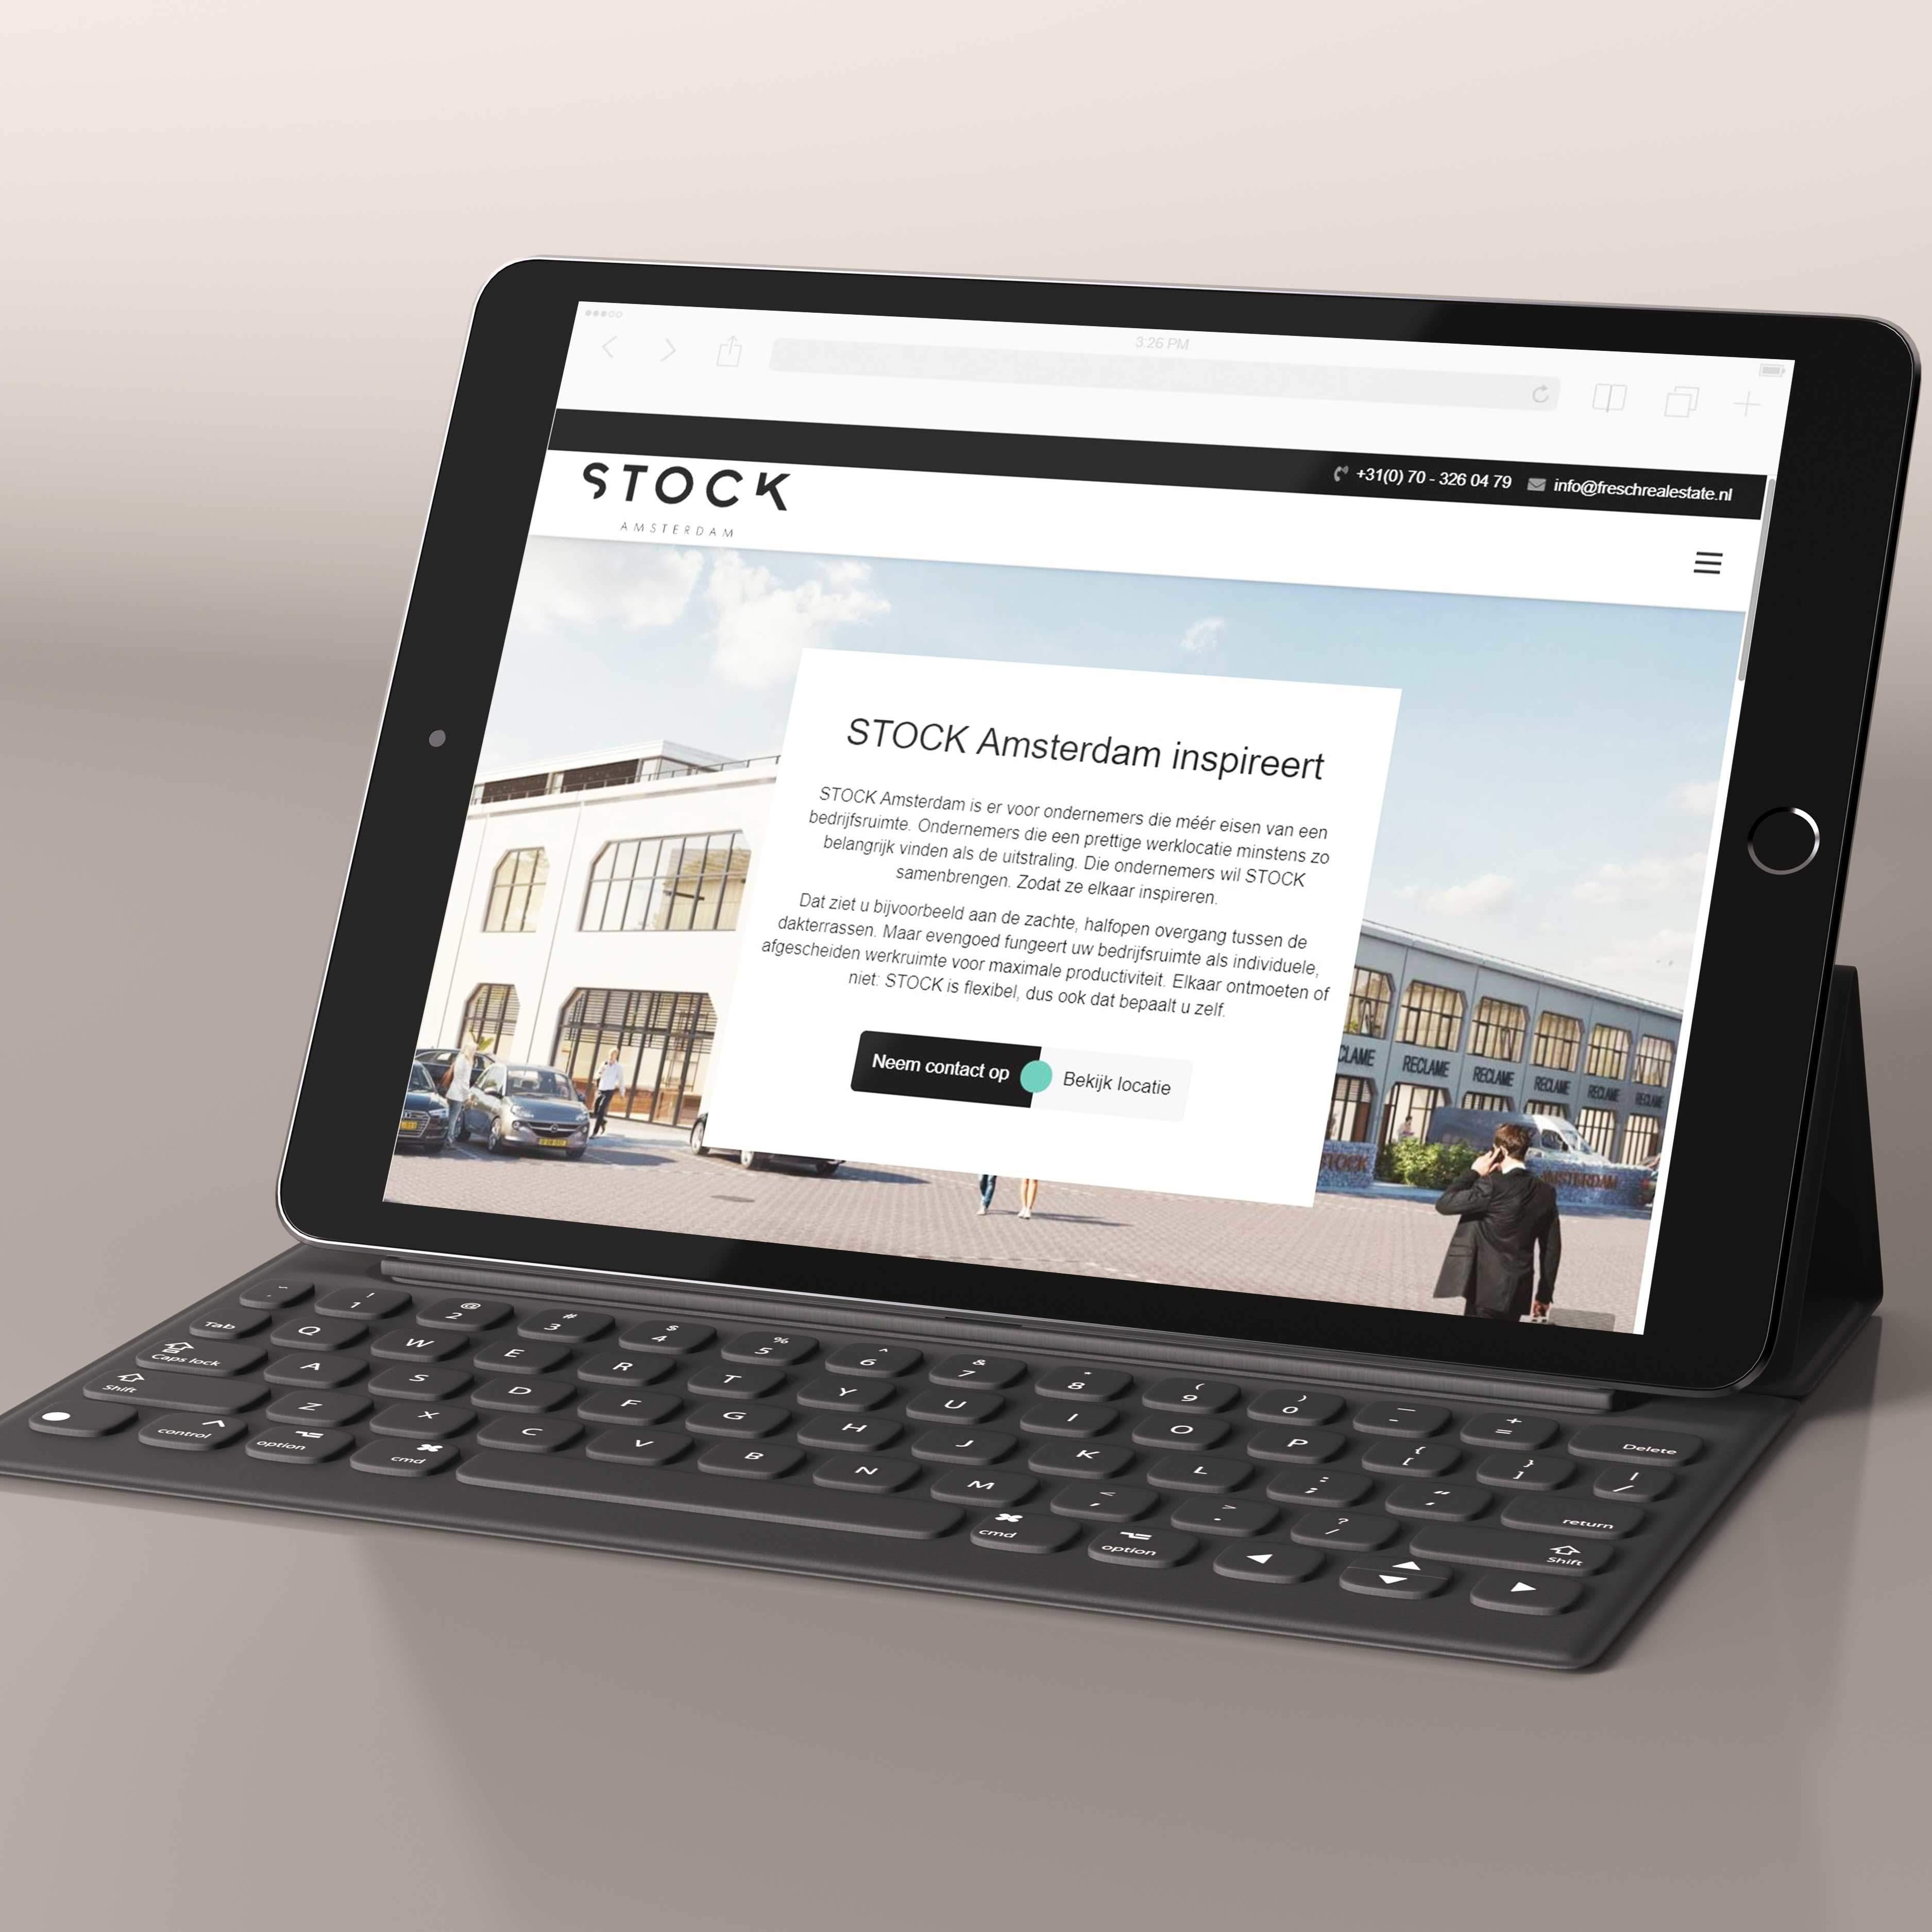 stock-amsterdam-online-marketing-bureau-webdevelopment-haarlem-made-marketing-4